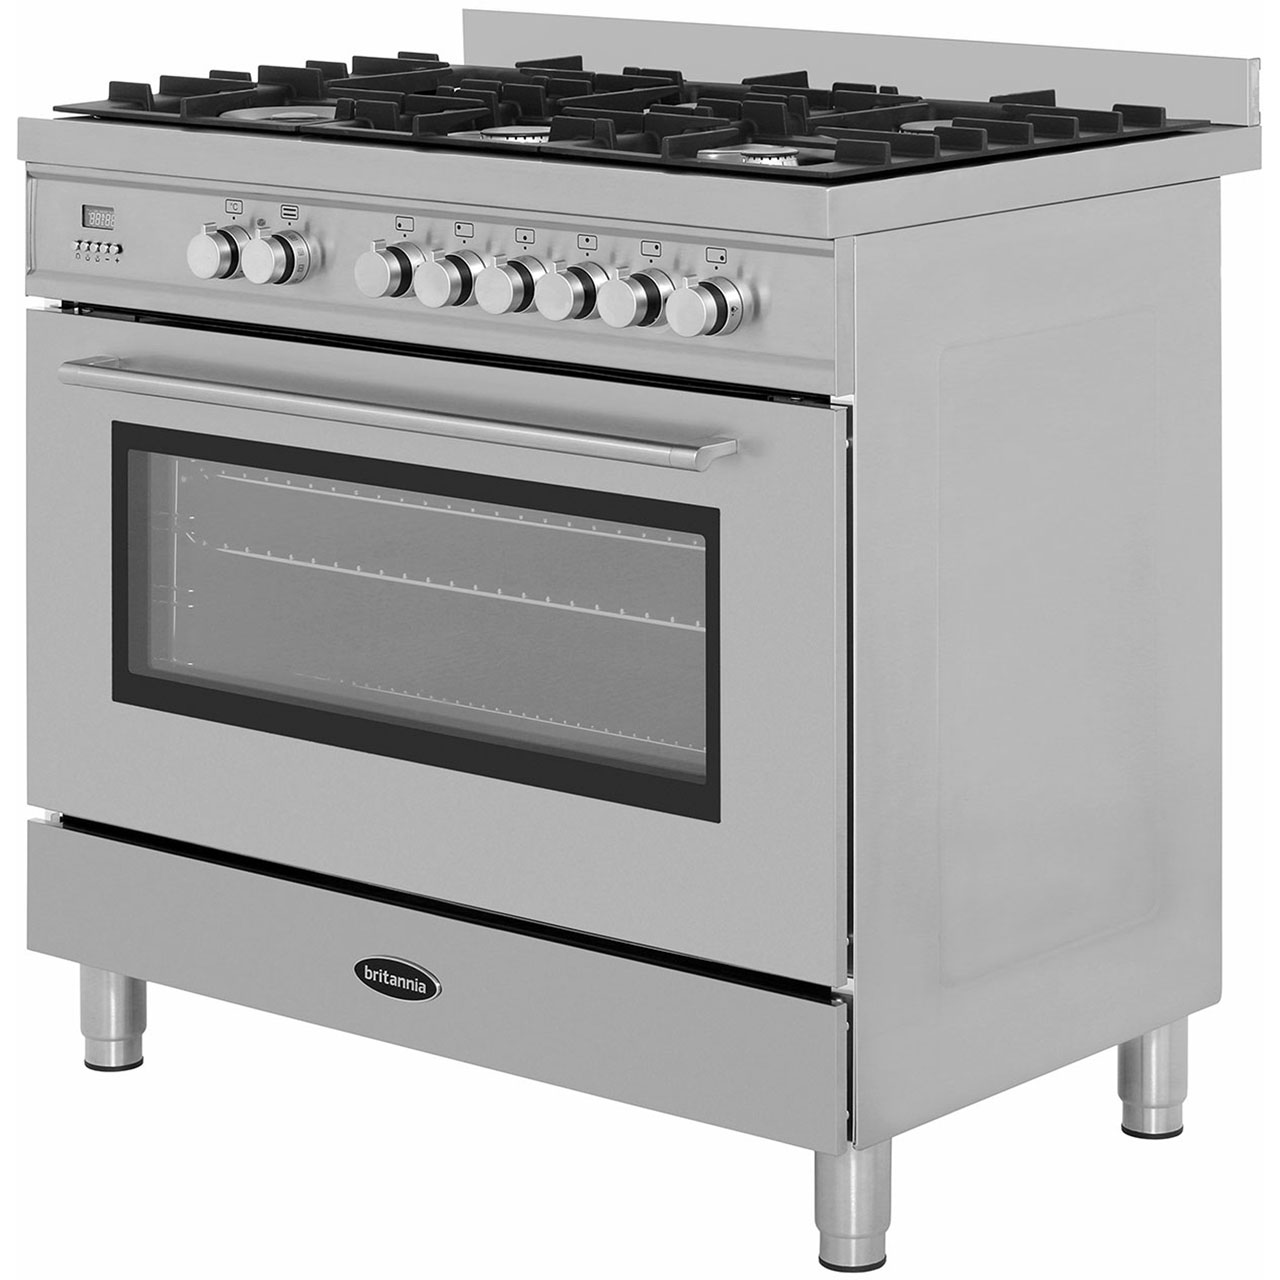 Boots kitchen appliances washing machines fridges more for Kitchen set q line